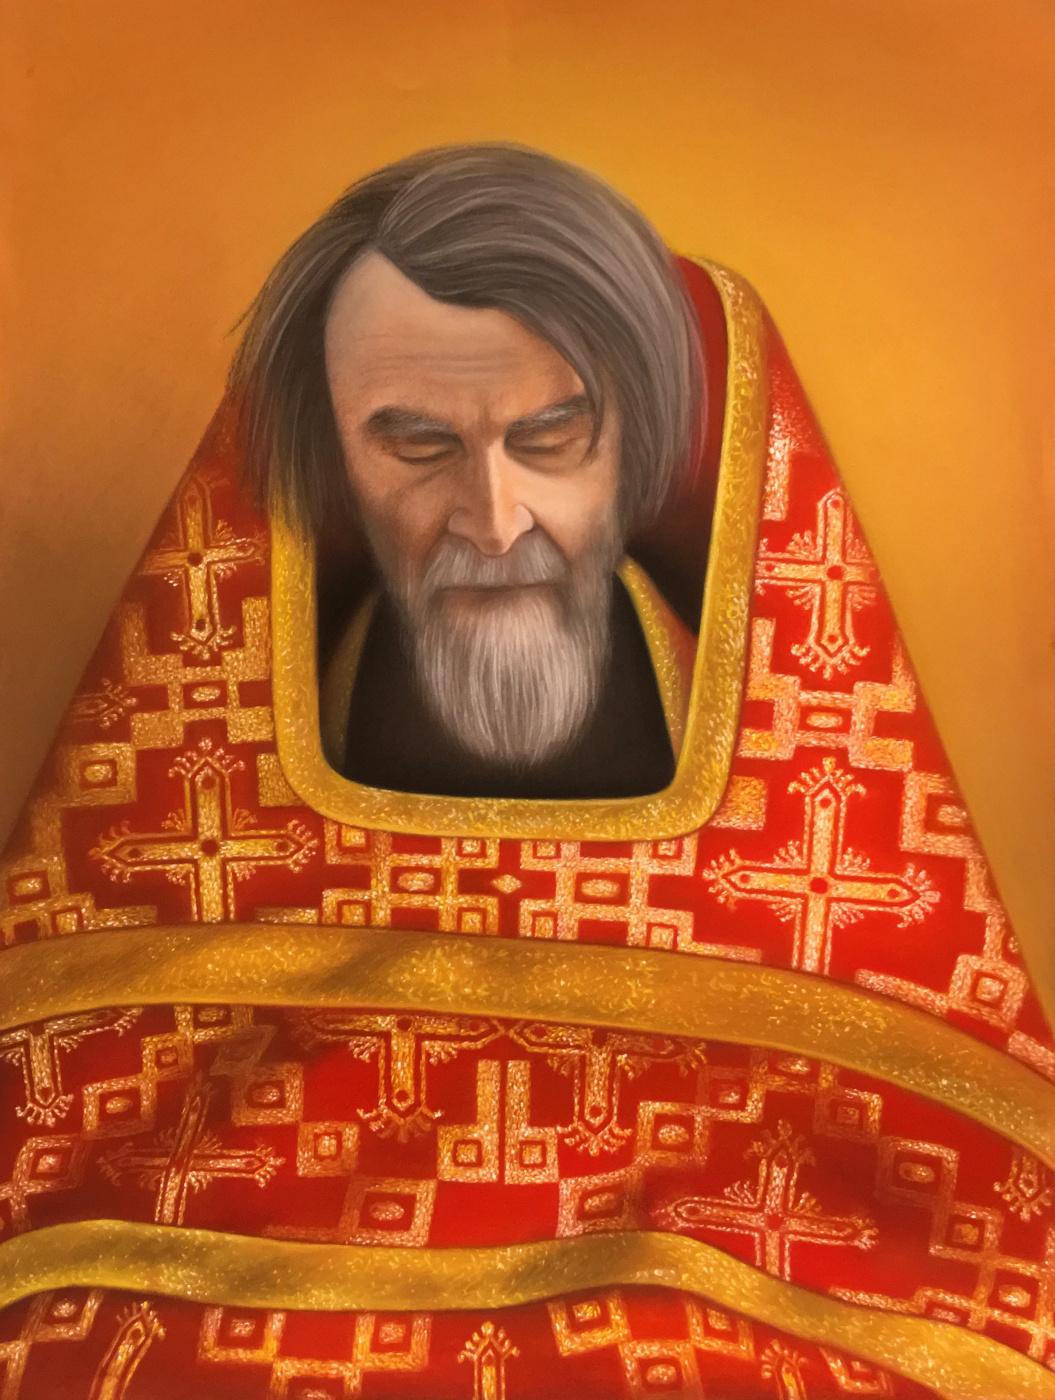 Julia Sergeevna Evtushenko. Portrait of a priest